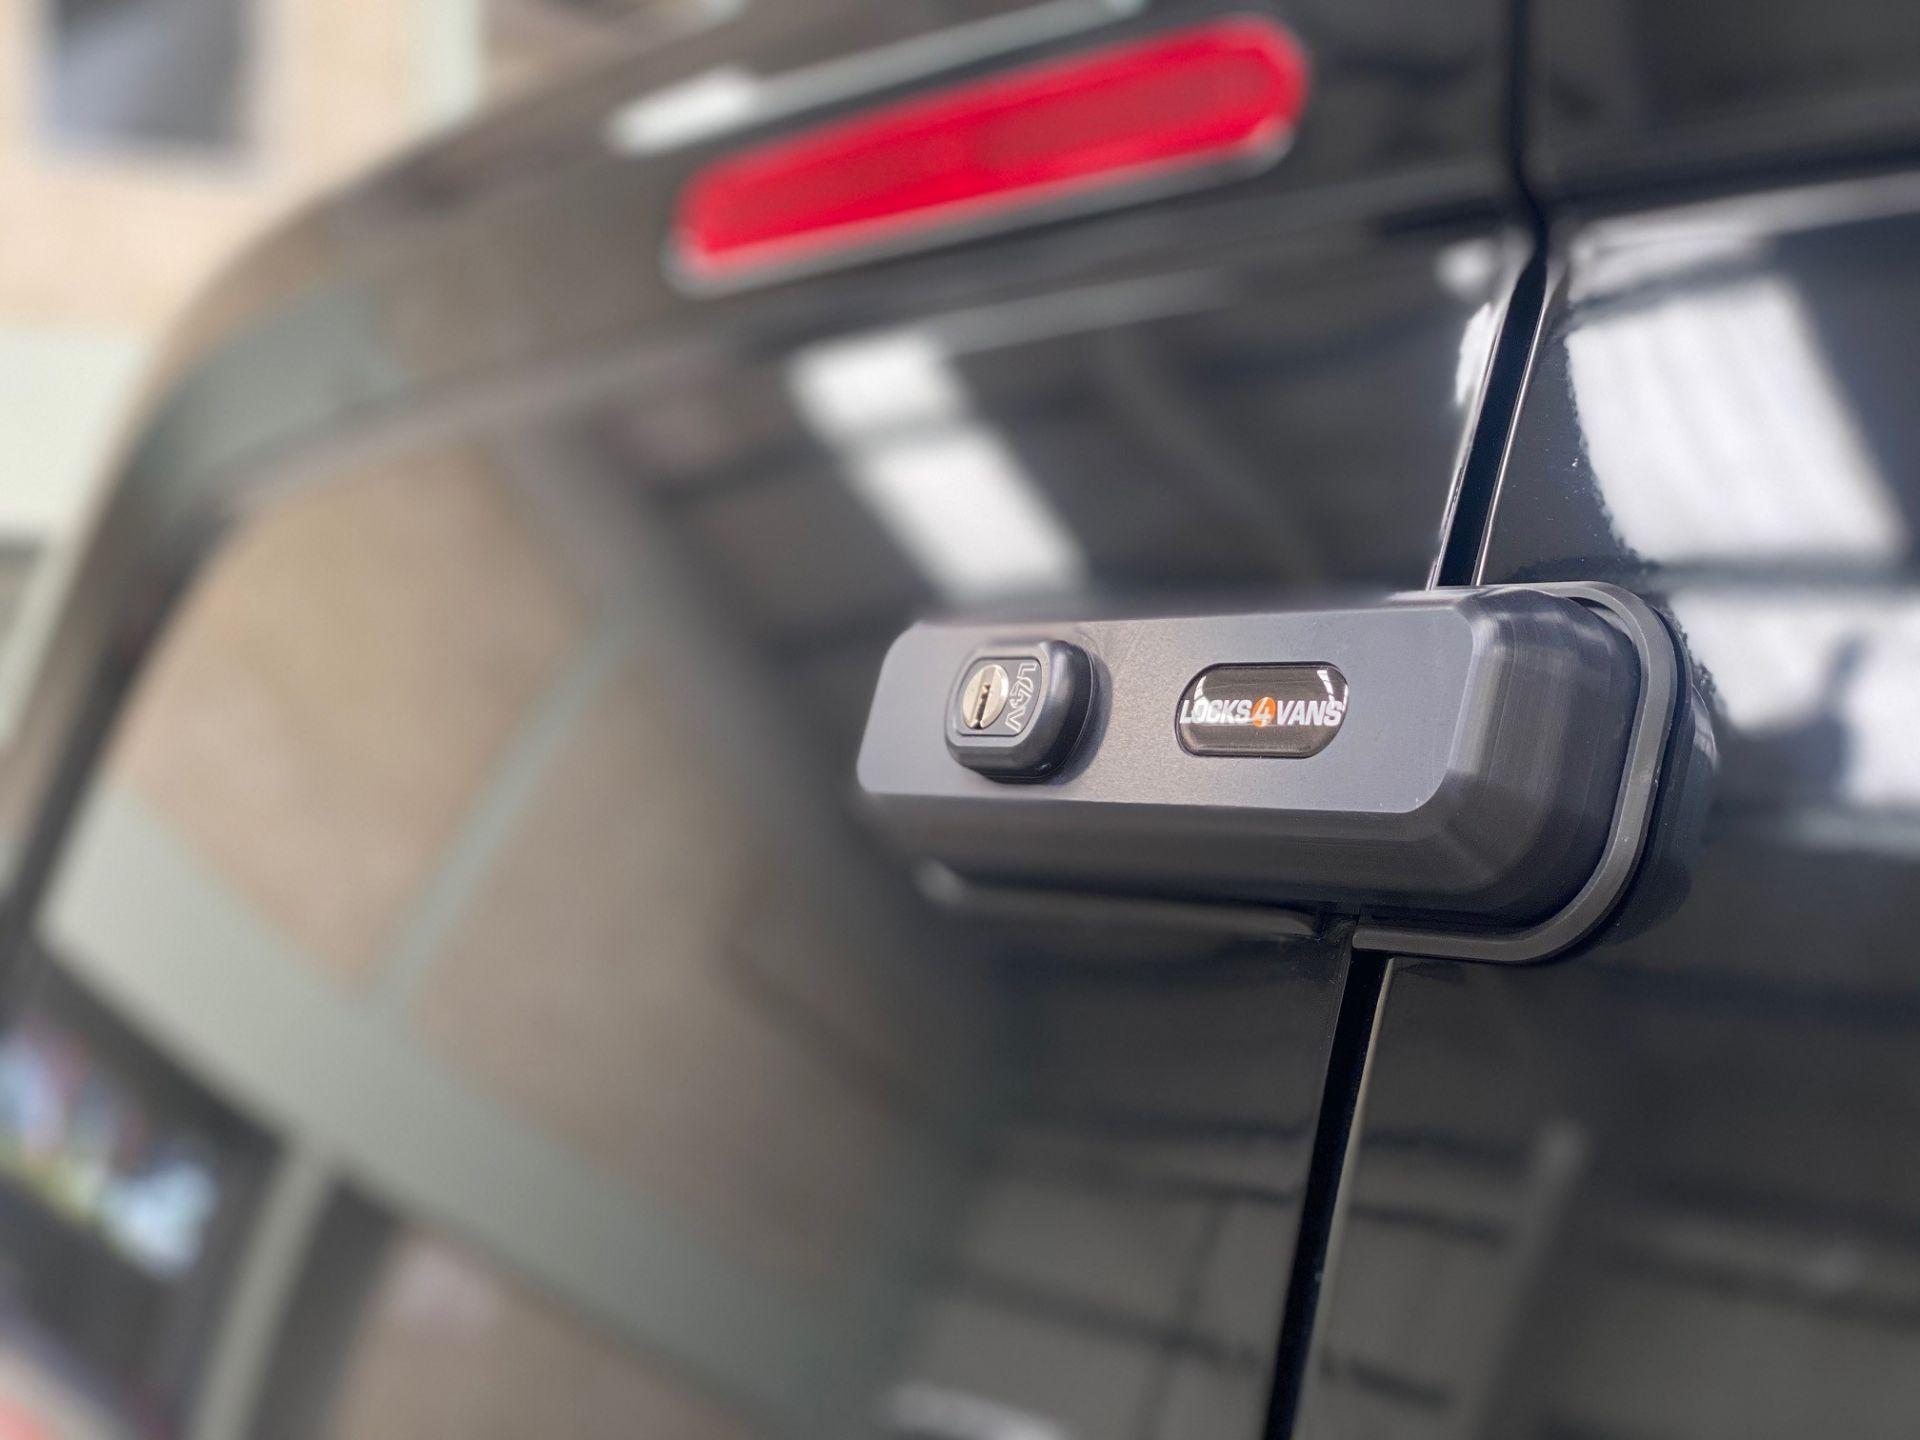 Citroen Berlingo 2019> Statement Lock